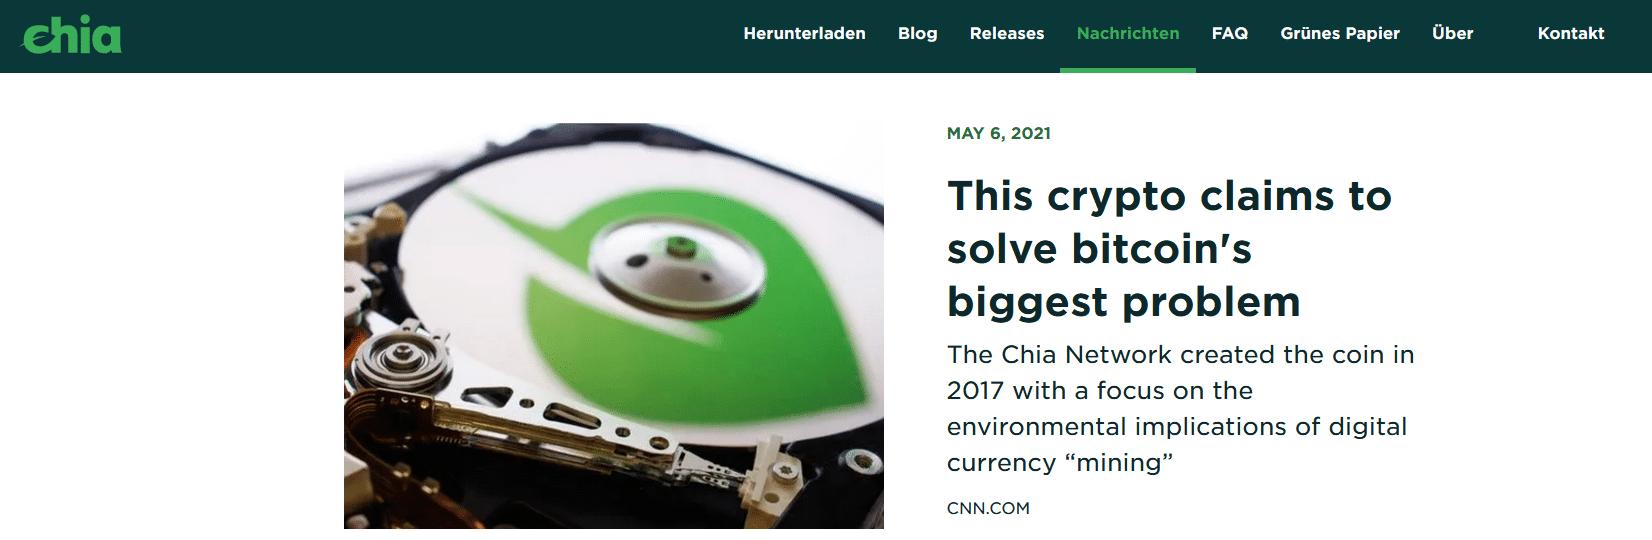 Chia Coin kaufen